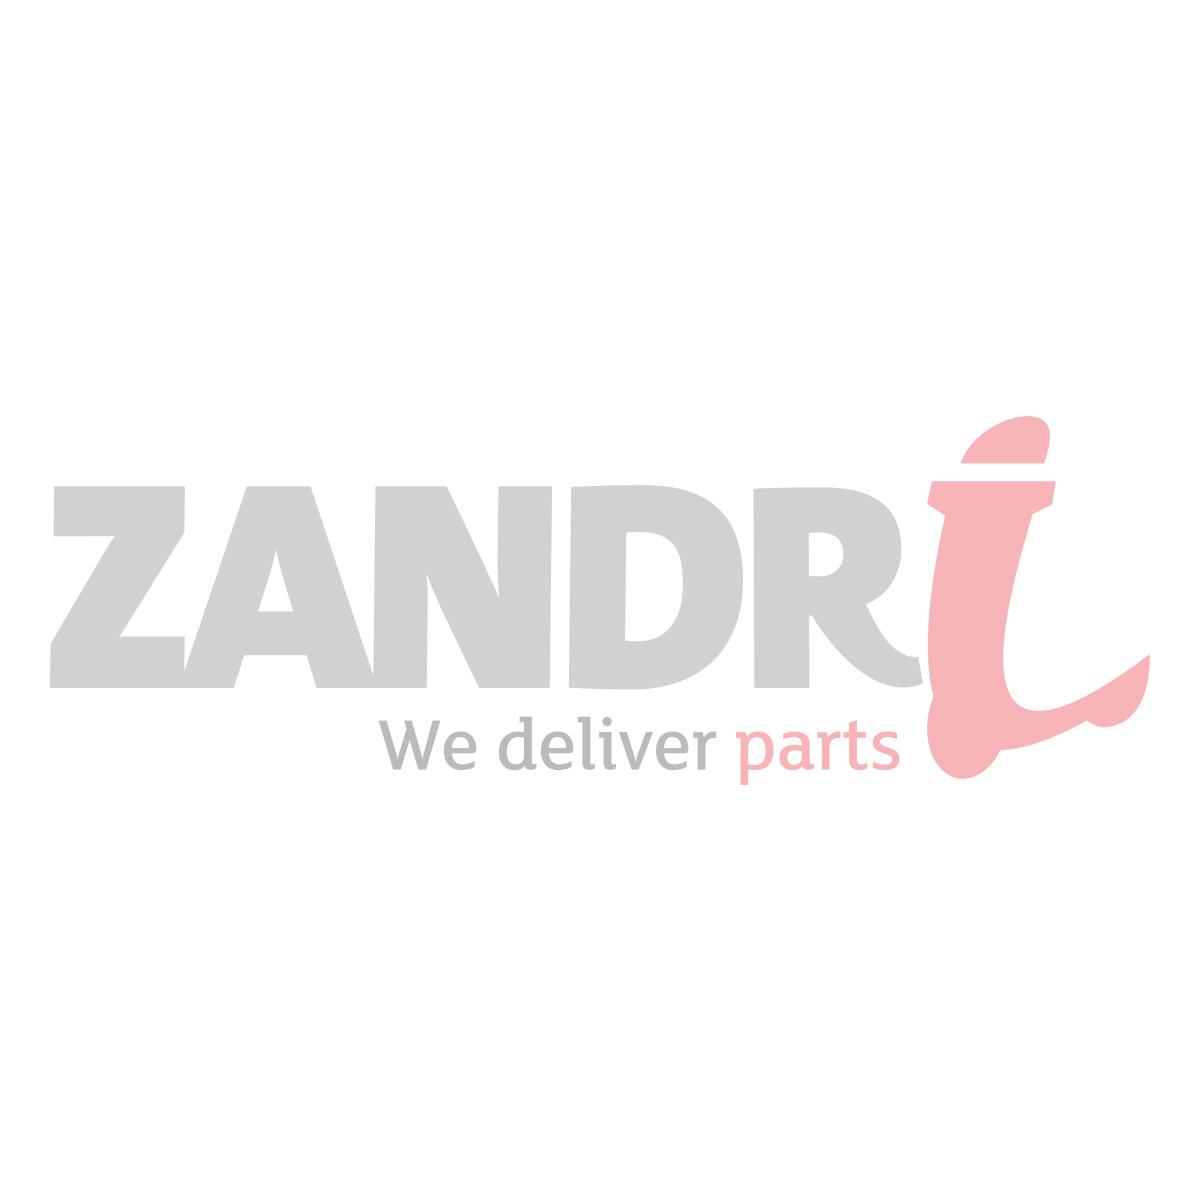 klep helmbak carburateur zip fr/zip fr rst/zip ot/zip rst/zip sp piag orig 27193